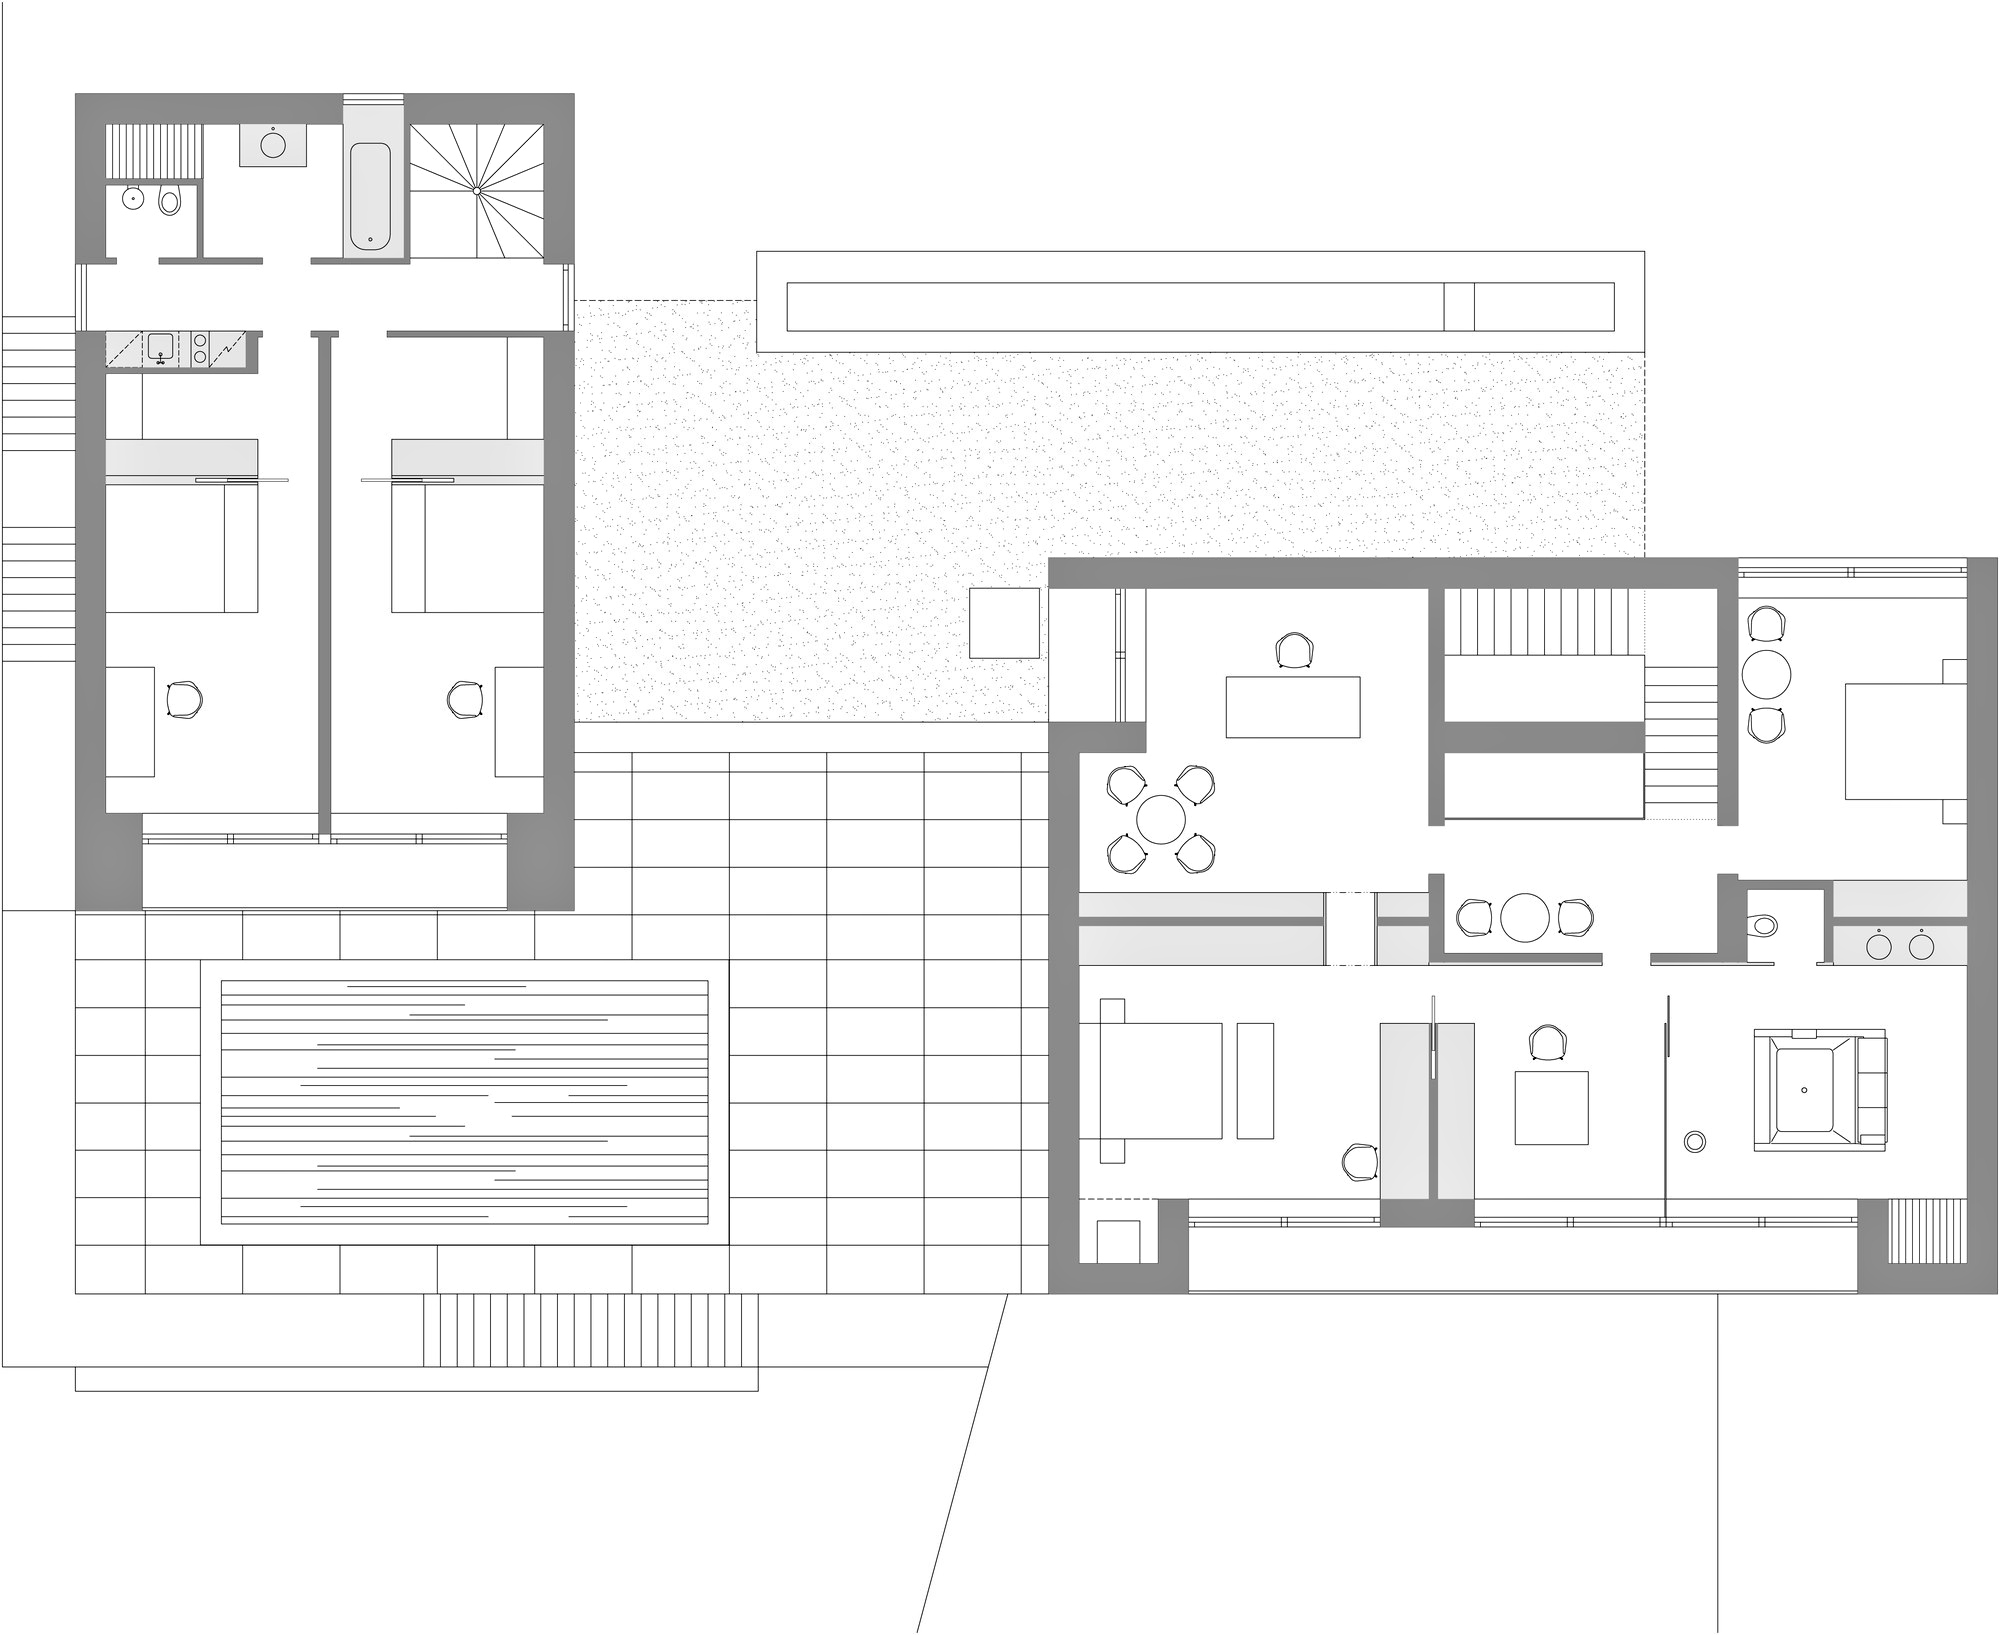 Floor Plans - Decin Villa Luxury Residence - Ústí nad Labem, Czech Republic